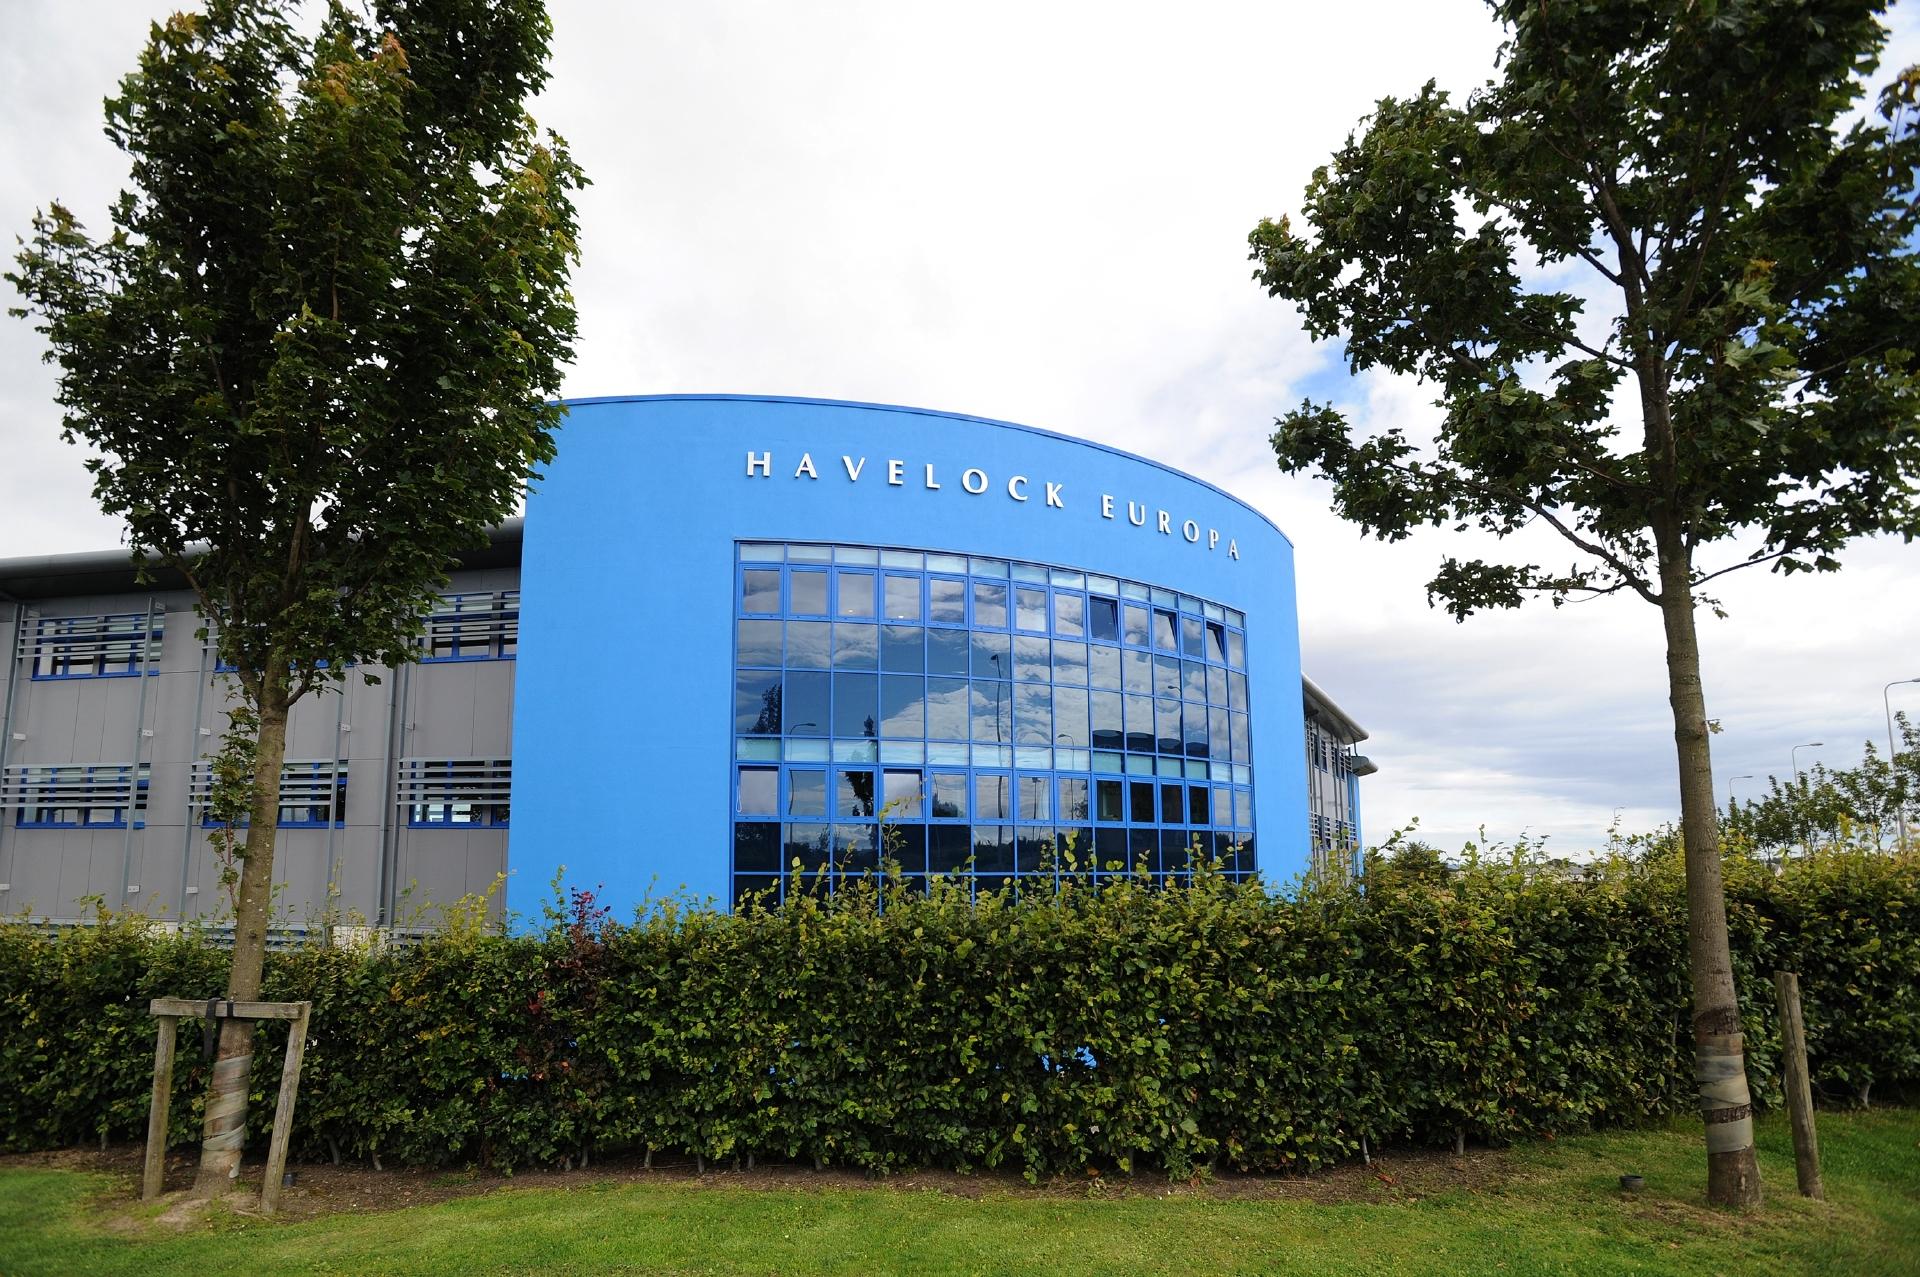 Havelock Europa's corporate headquarters in Kirkcaldy